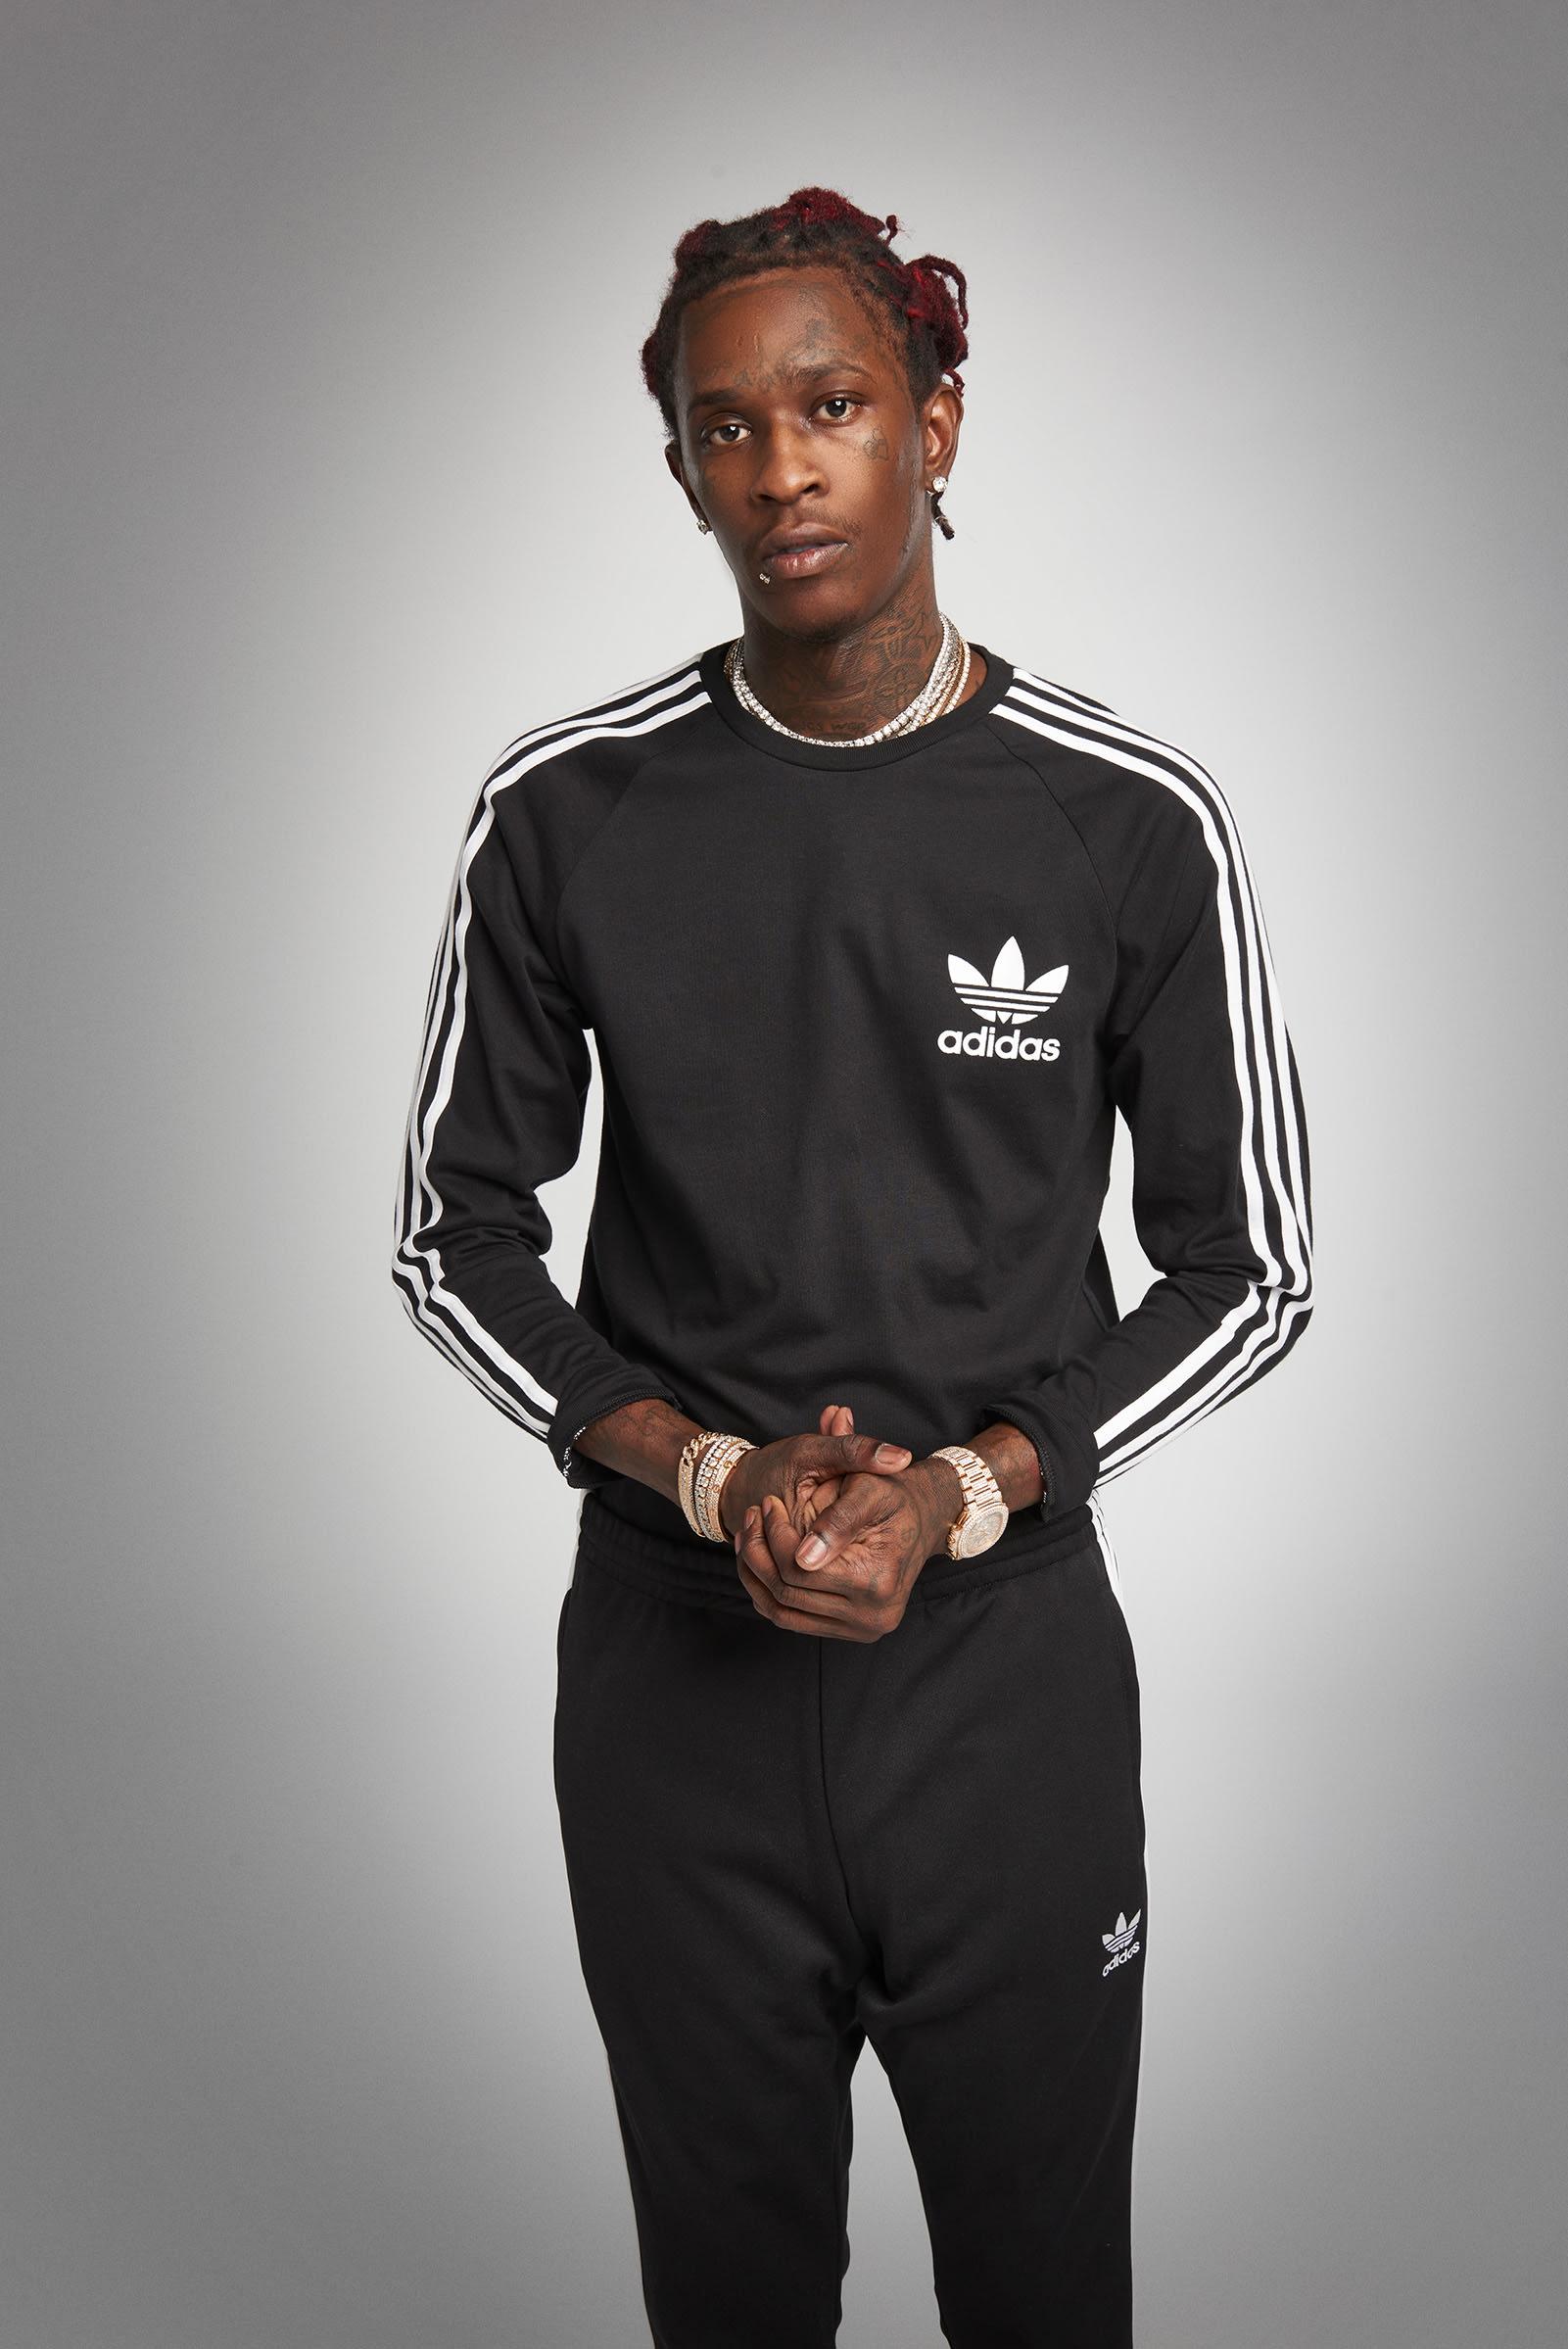 Adidas Endorsers - Athletes Endorsed by Adidas ...